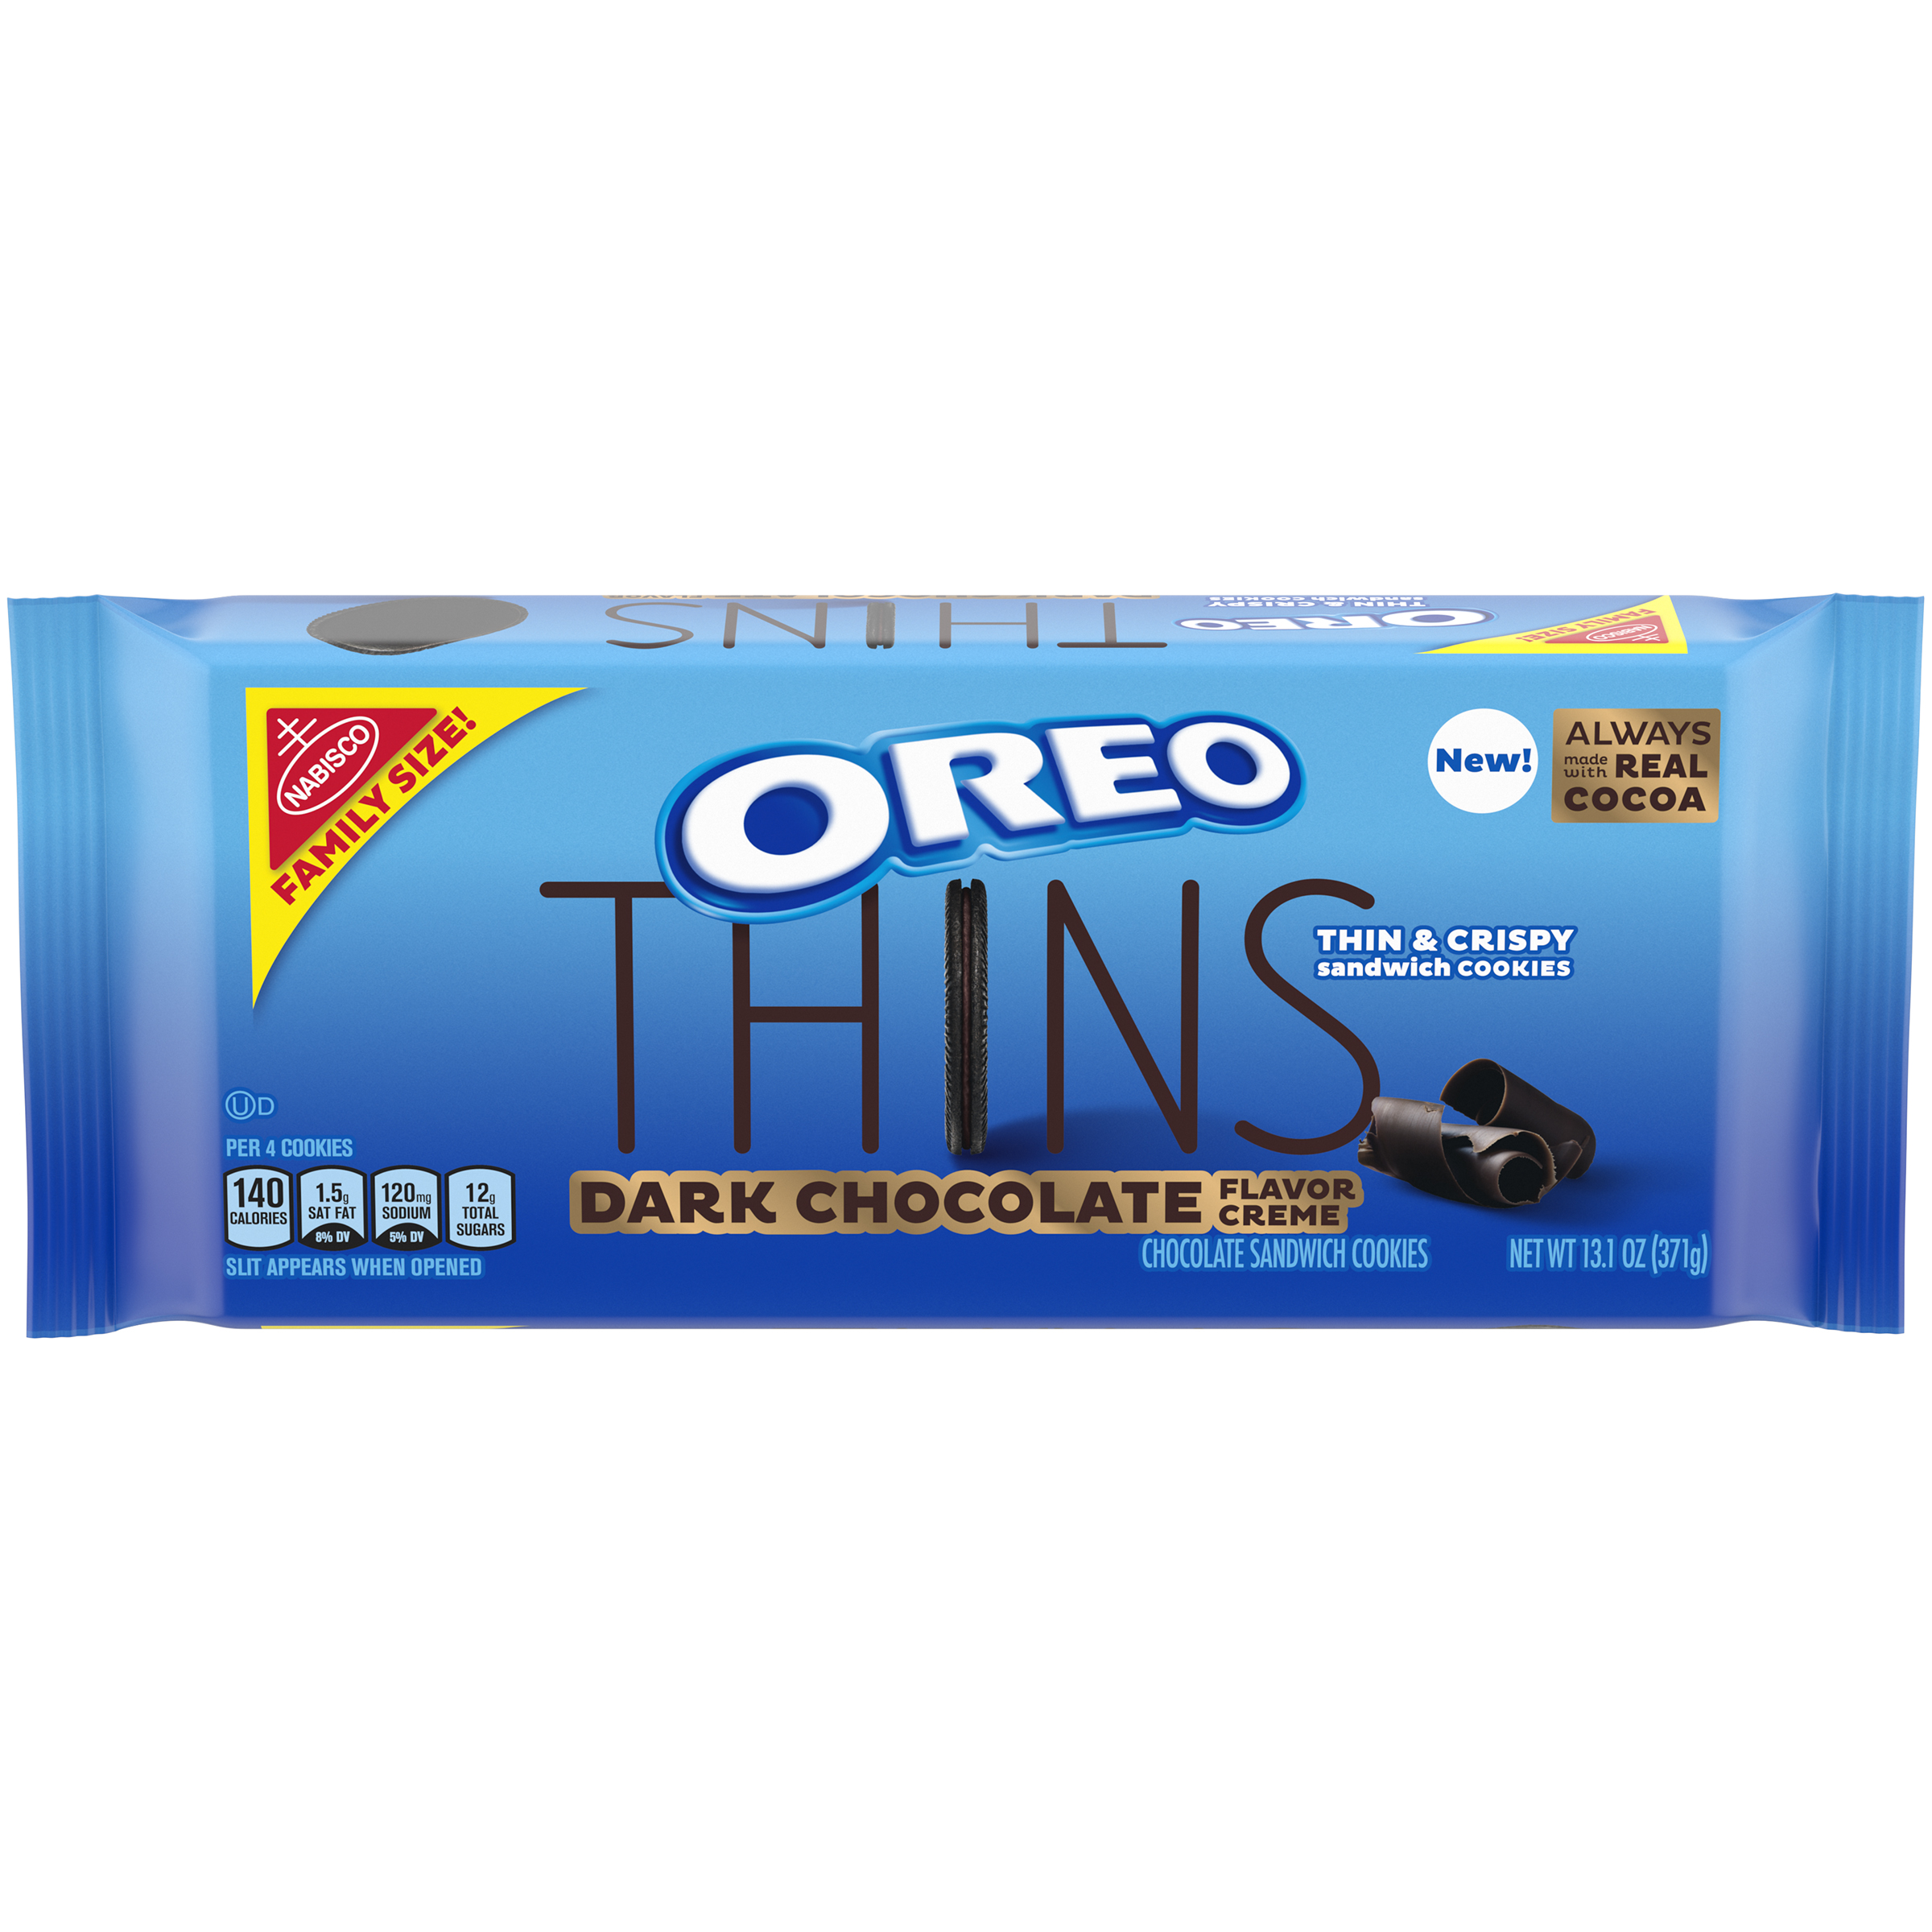 OREO Thins Dark Chocolate Sandwich Cookies 13.1 oz